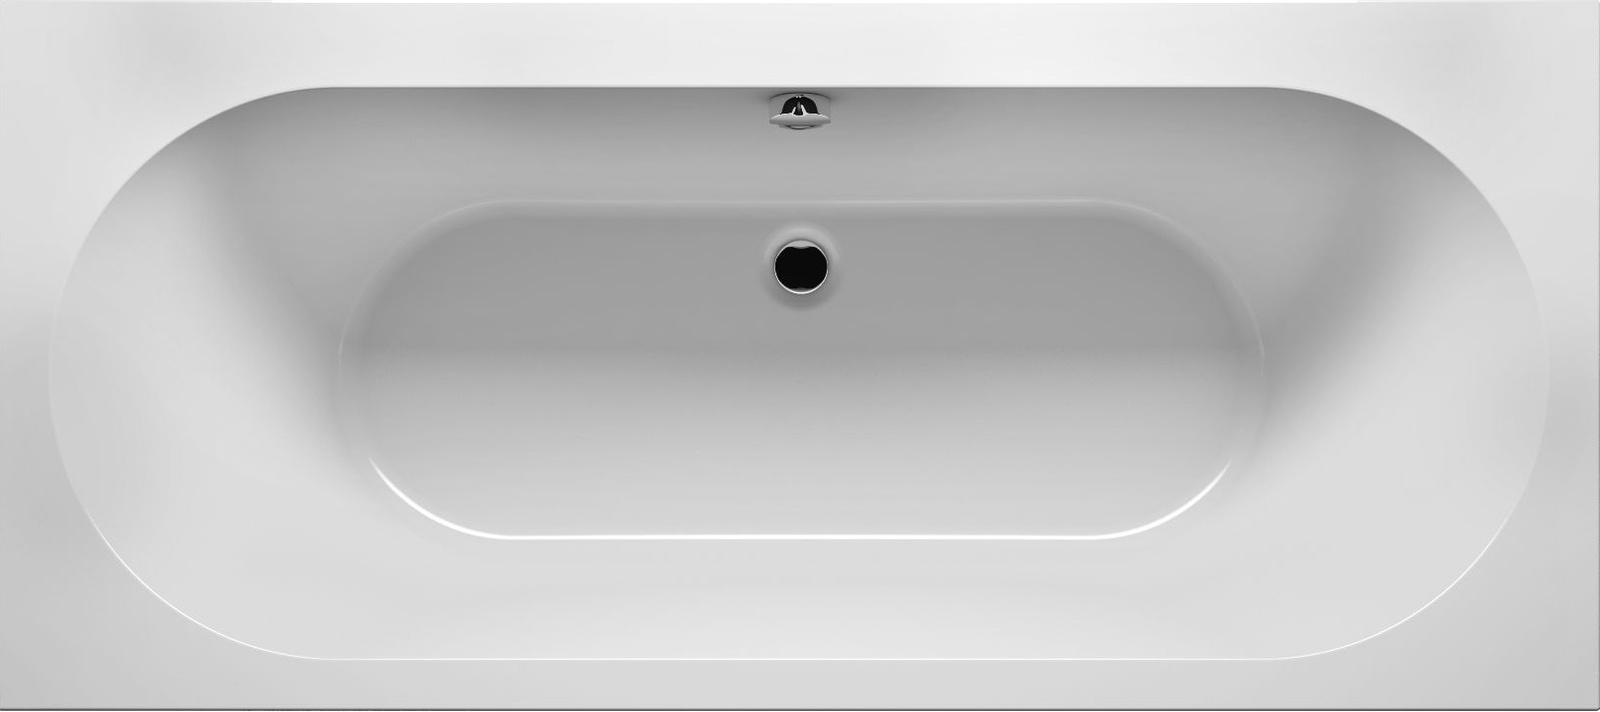 Ванна Riho BB5500500000000 акриловая ванна riho carolina bb5500500000000 190x80